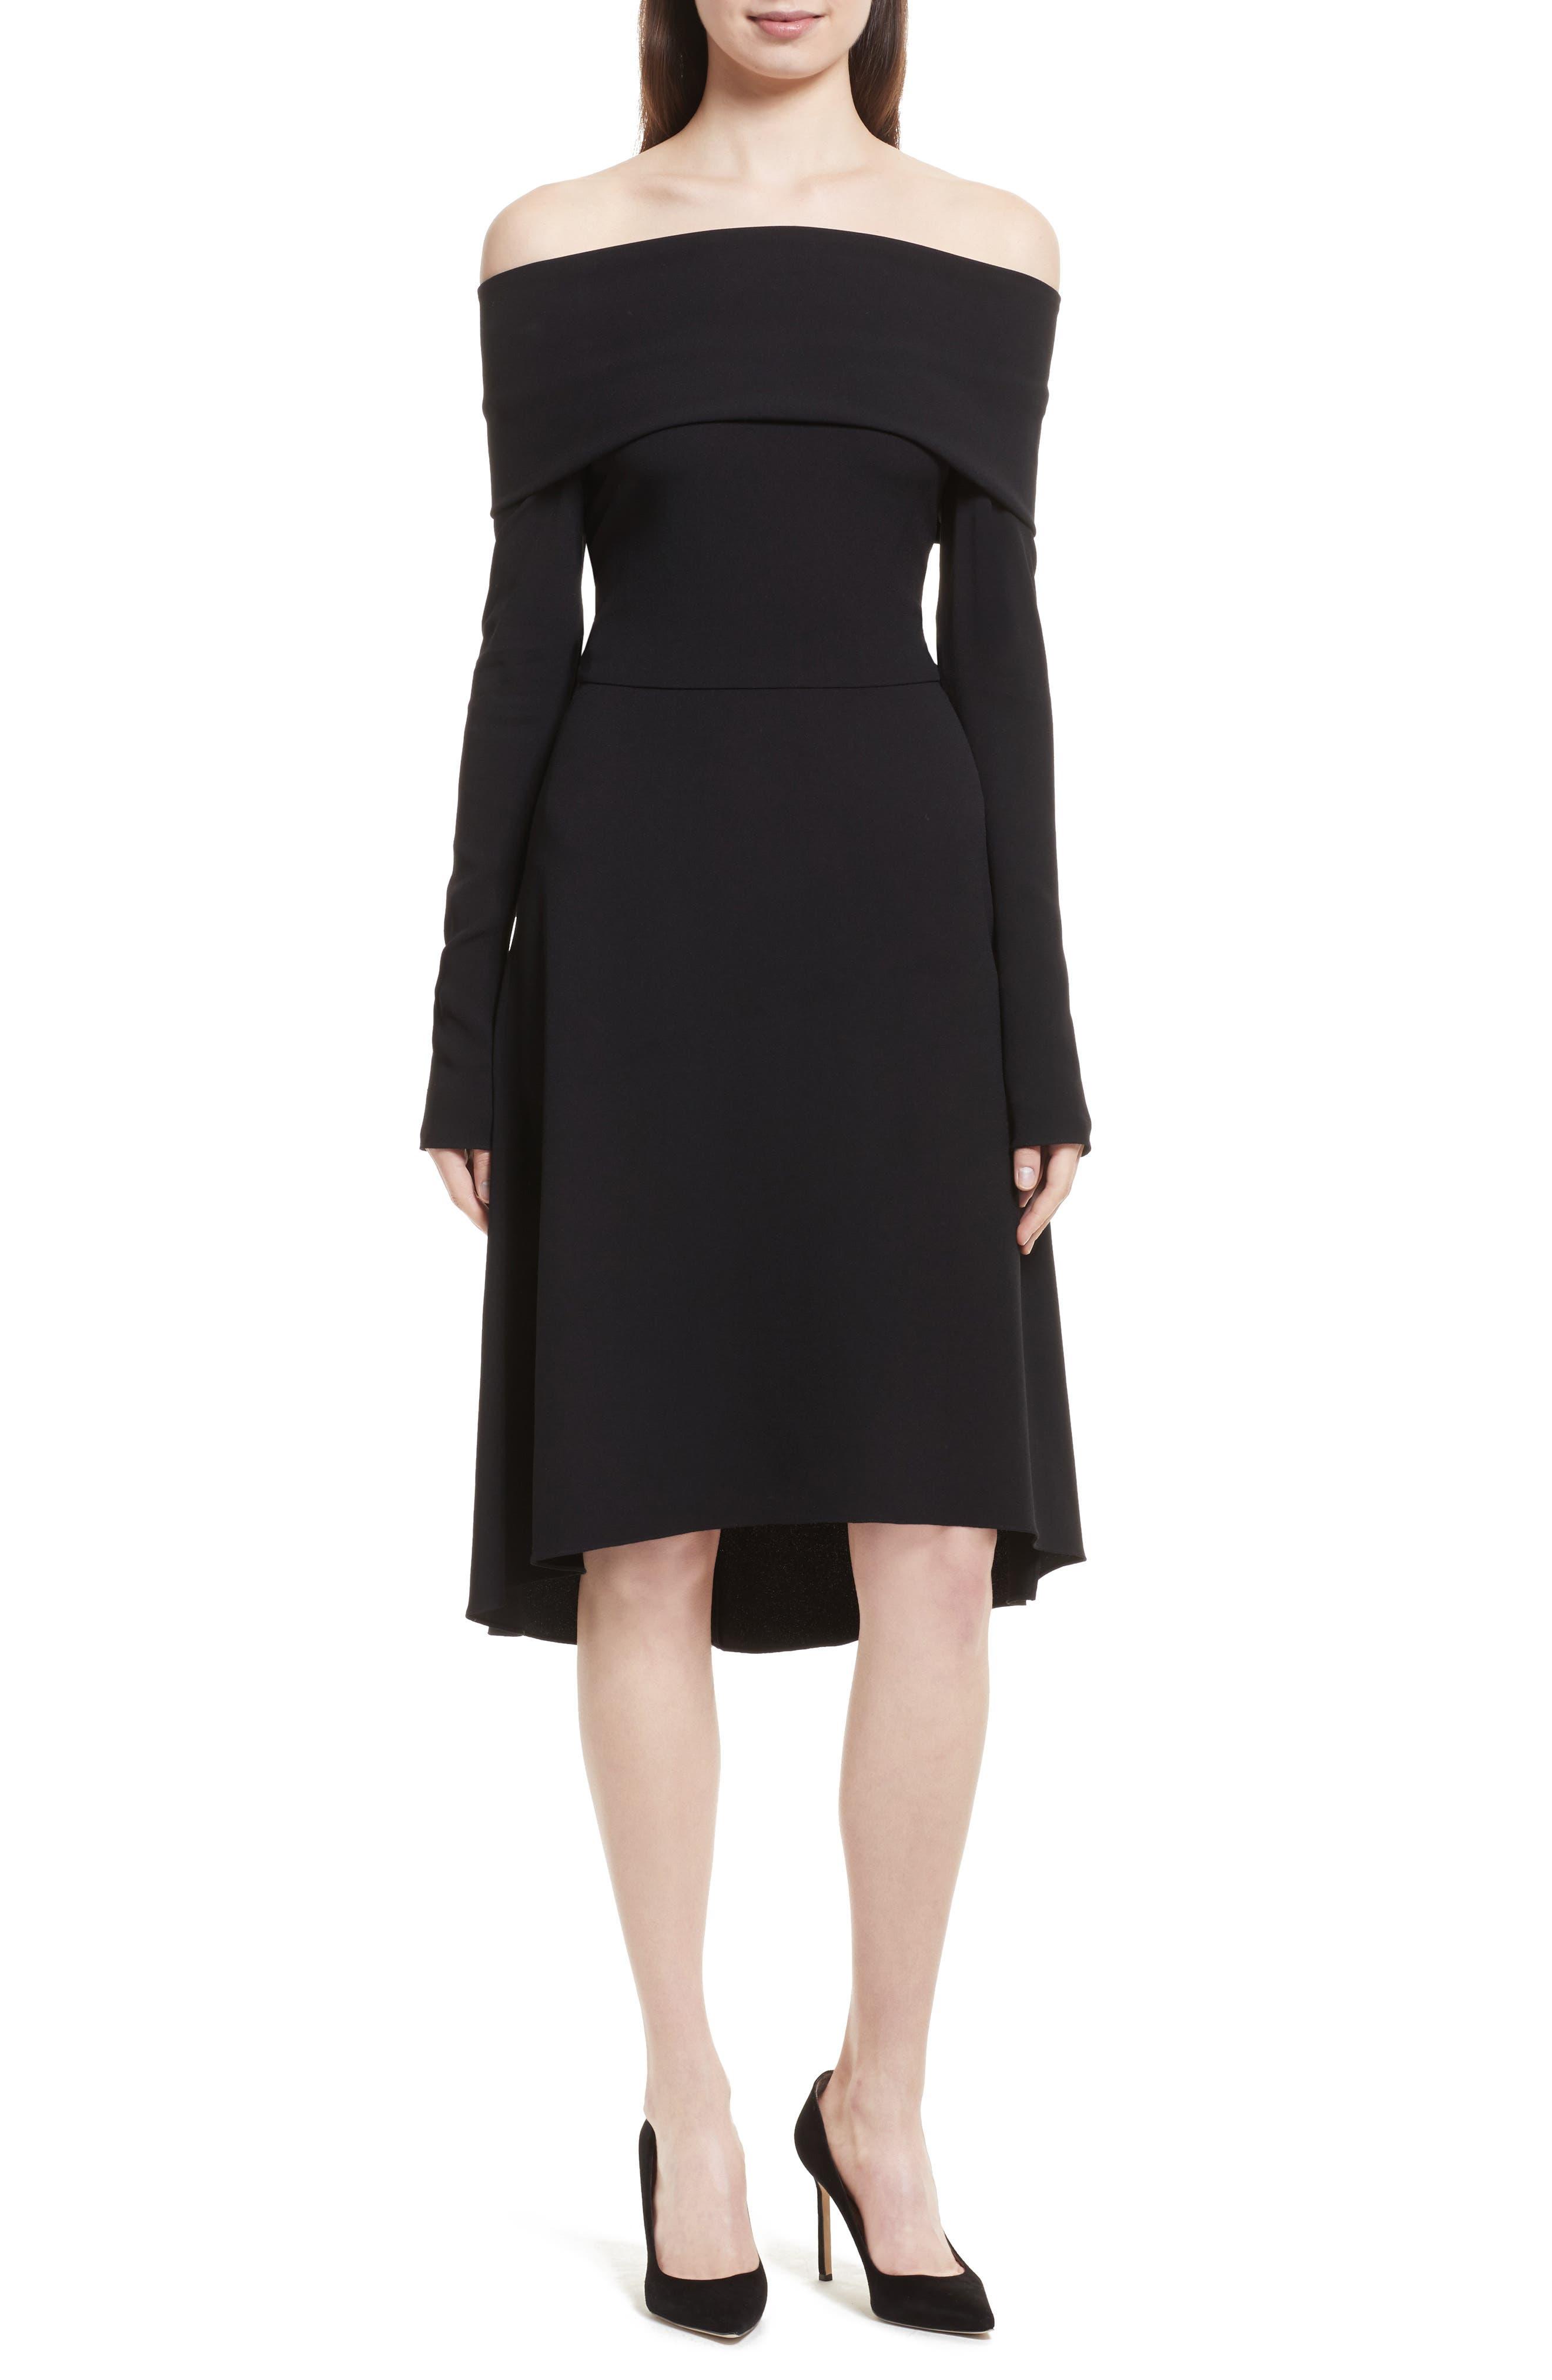 Alternate Image 1 Selected - Theory Kensington Off the Shoulder Foldover Dress